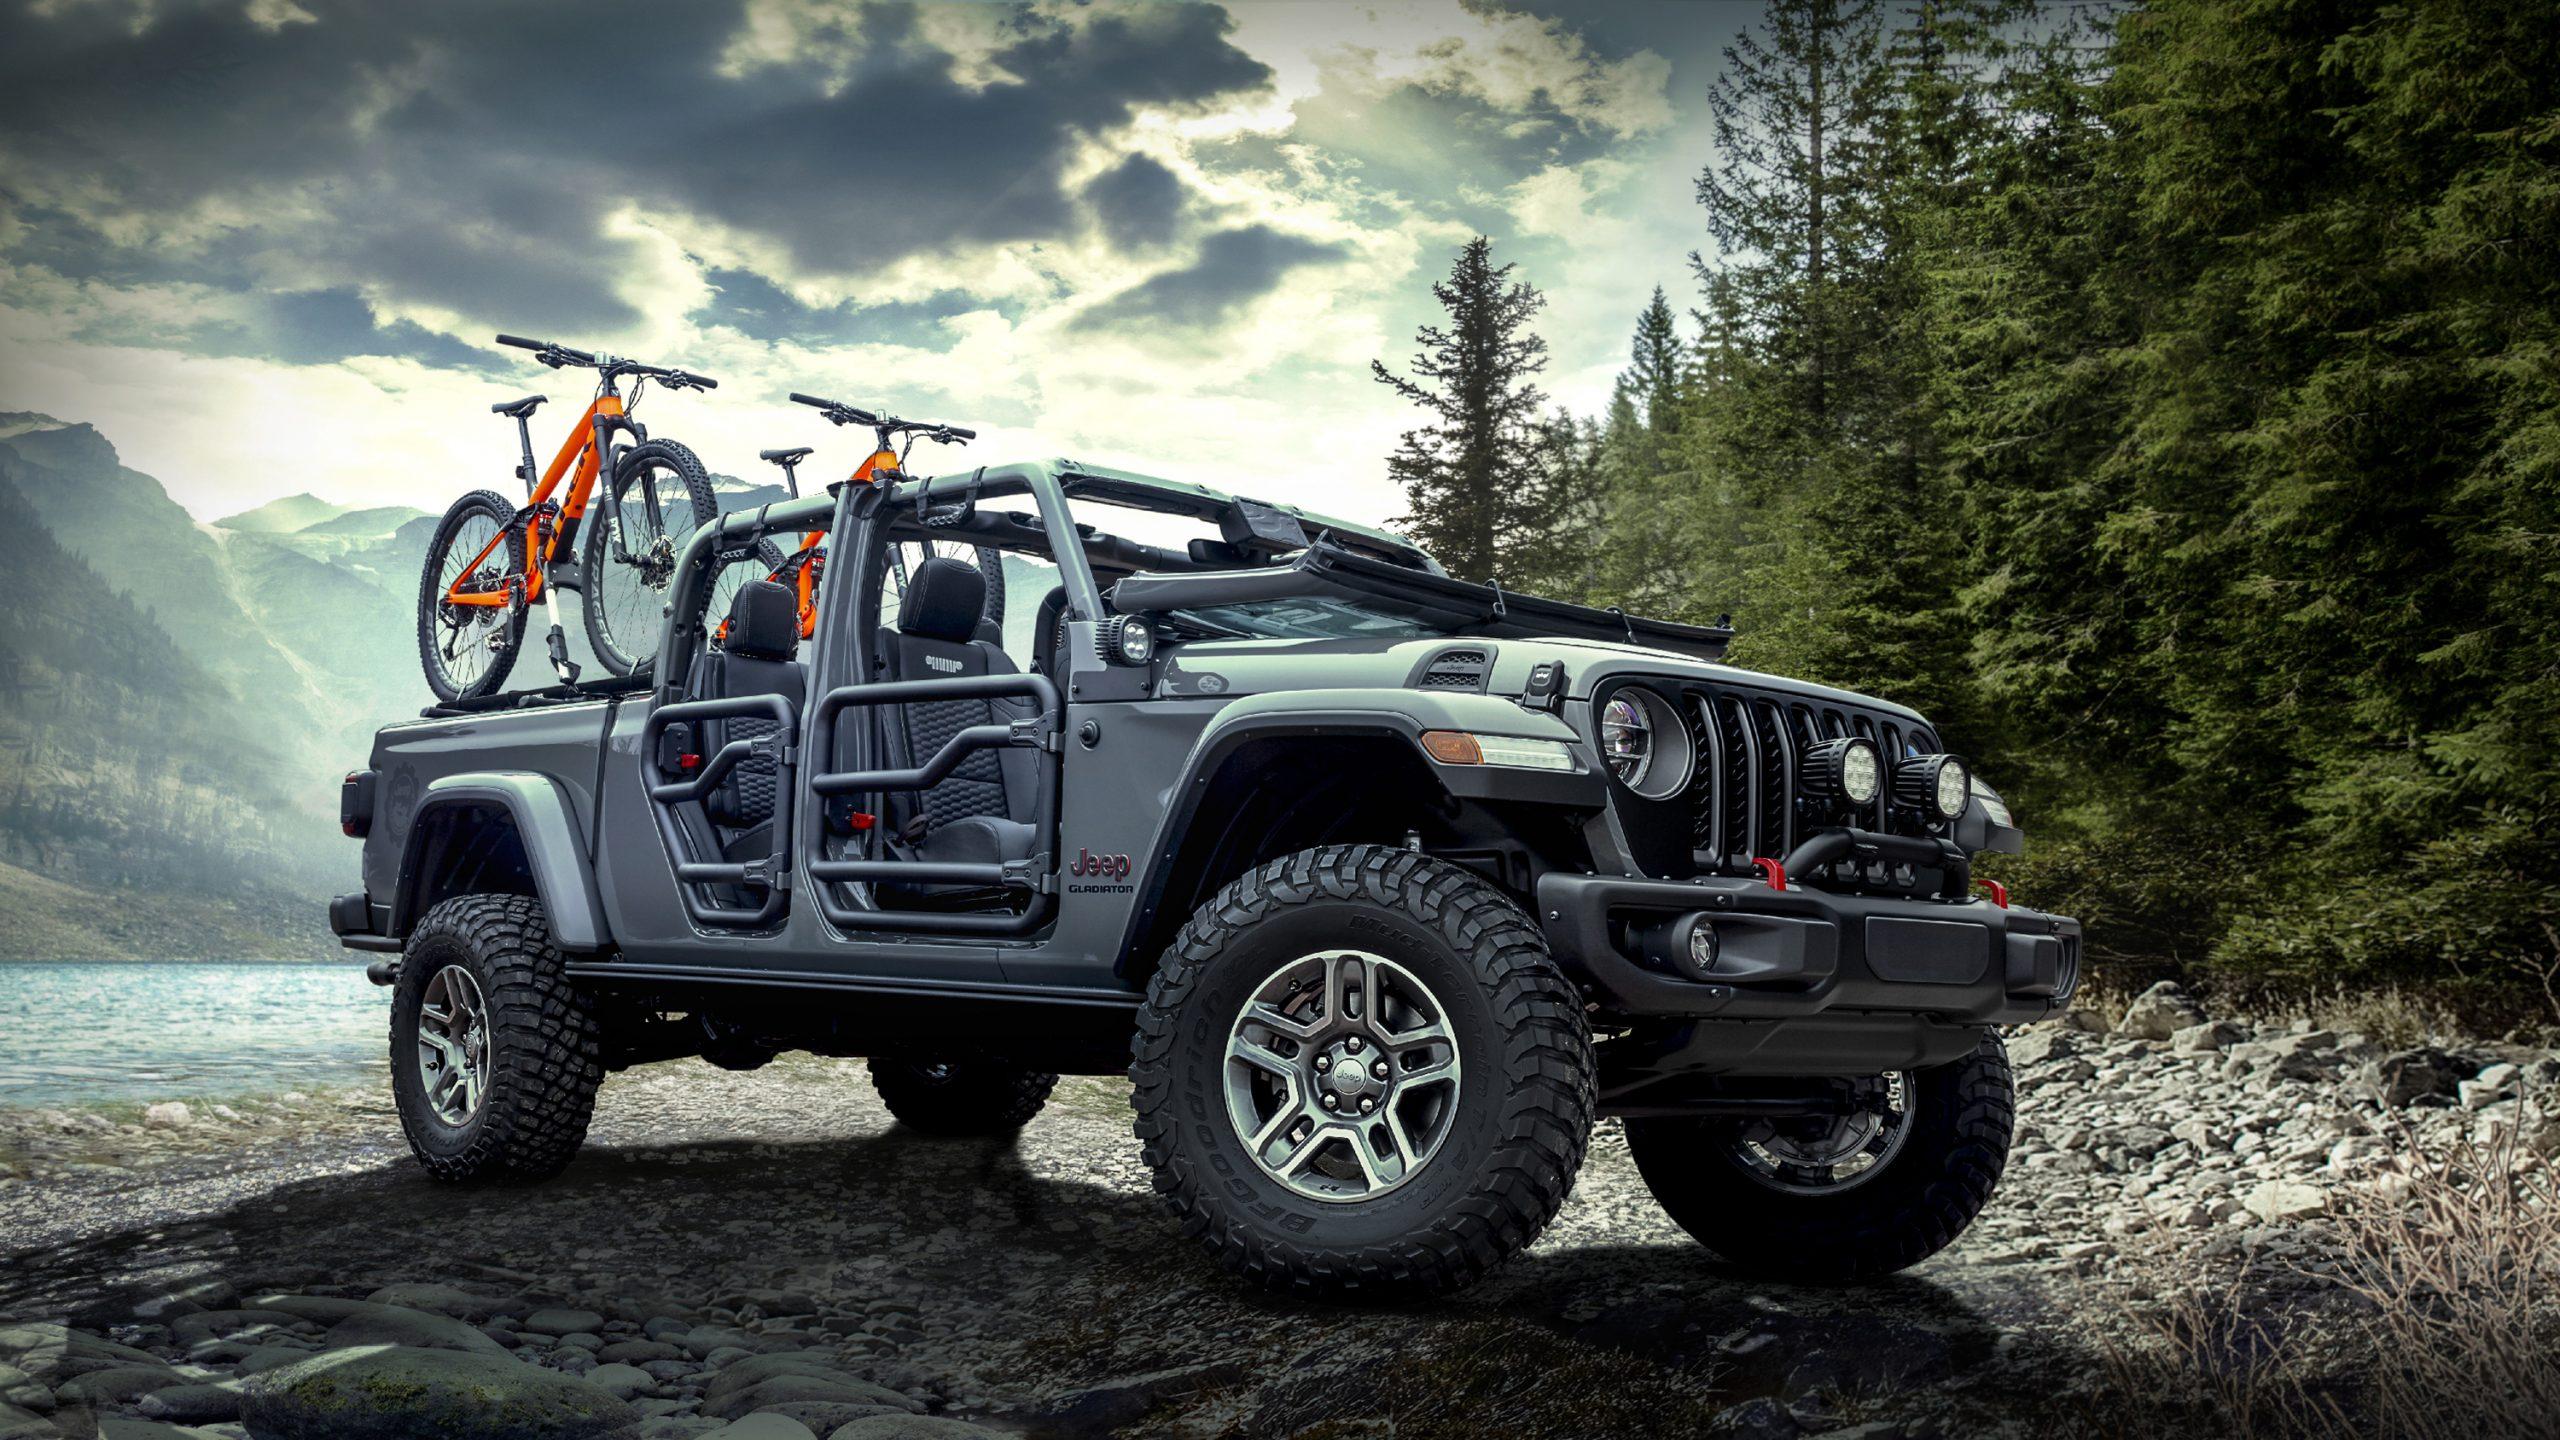 Jeep U.S Sales Figures